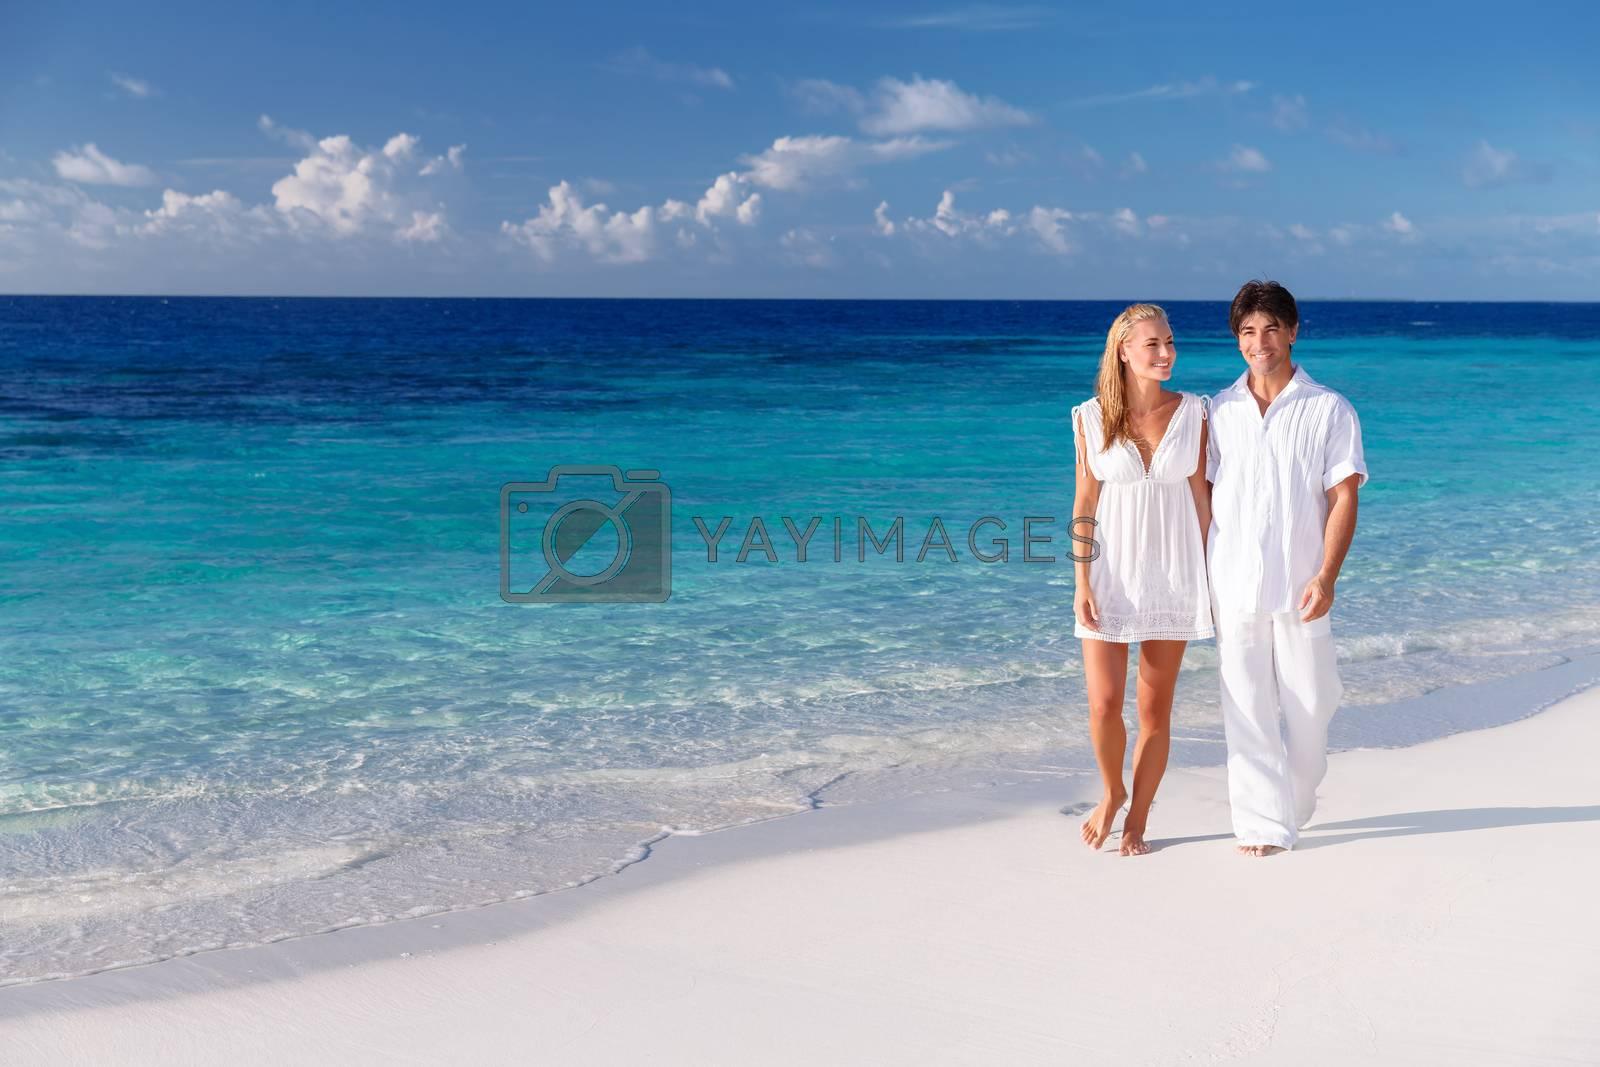 Royalty free image of Romantic honeymoon by Anna_Omelchenko